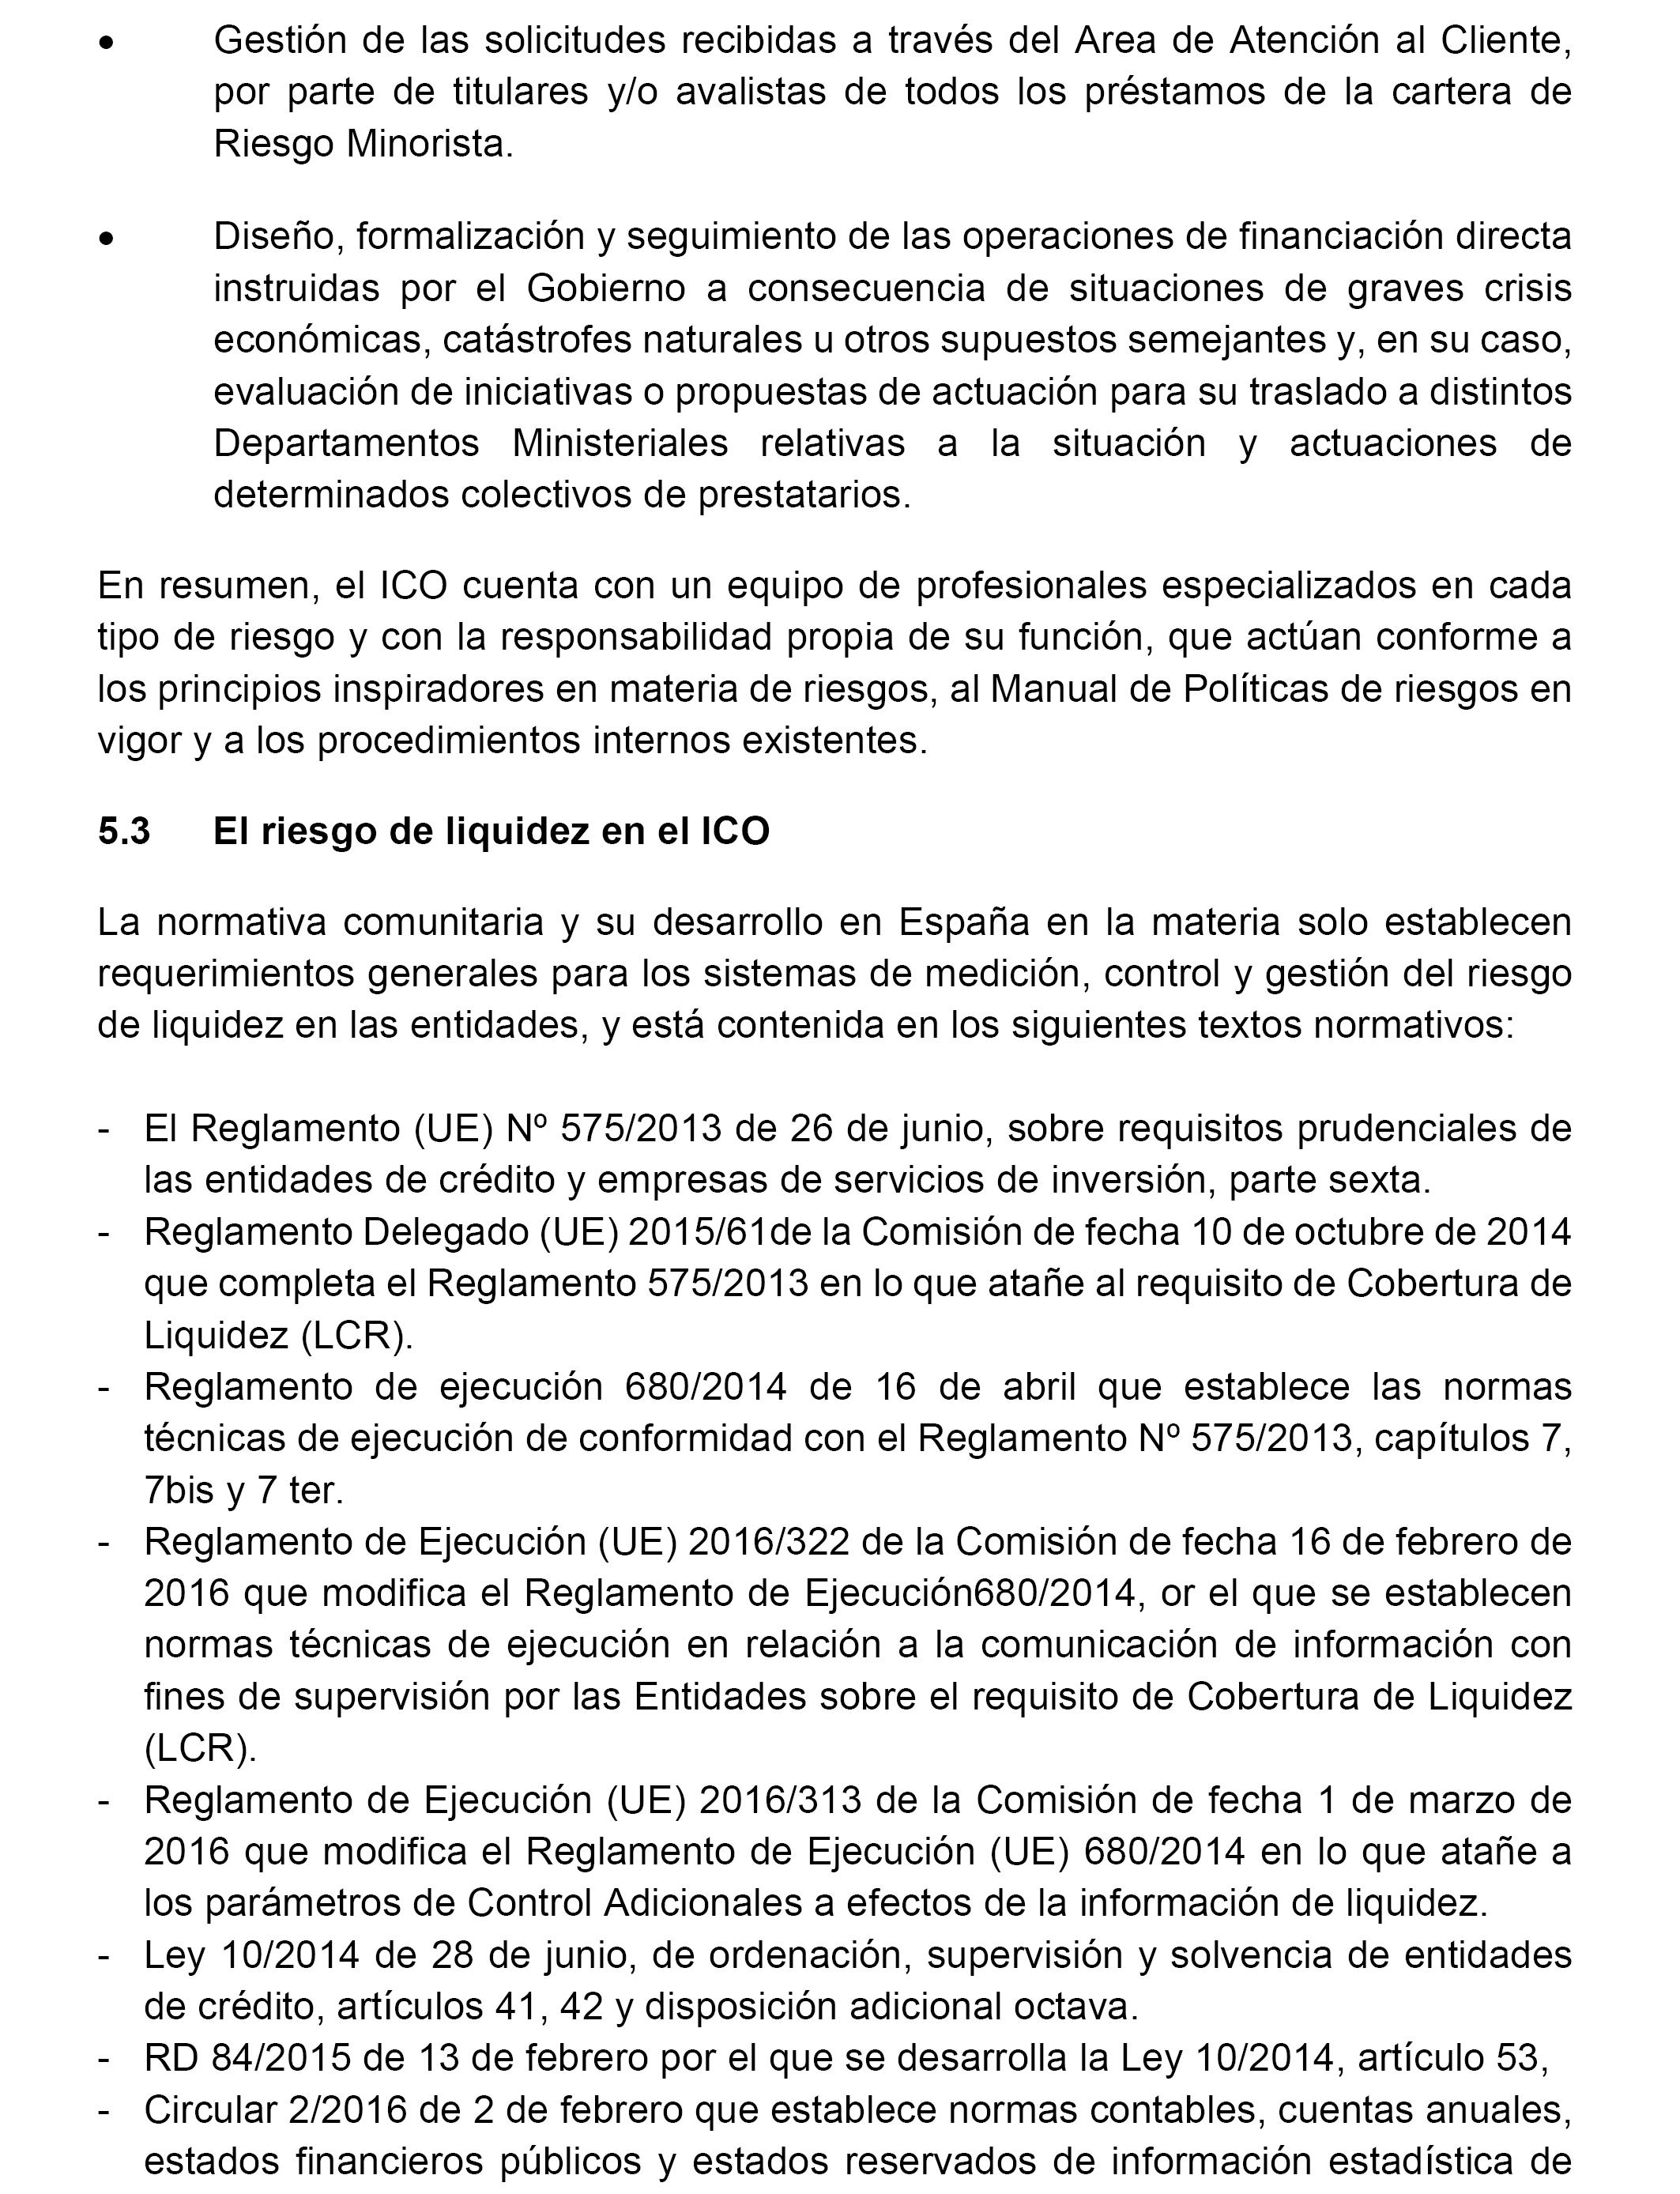 BOE.es - Documento BOE-A-2018-11486